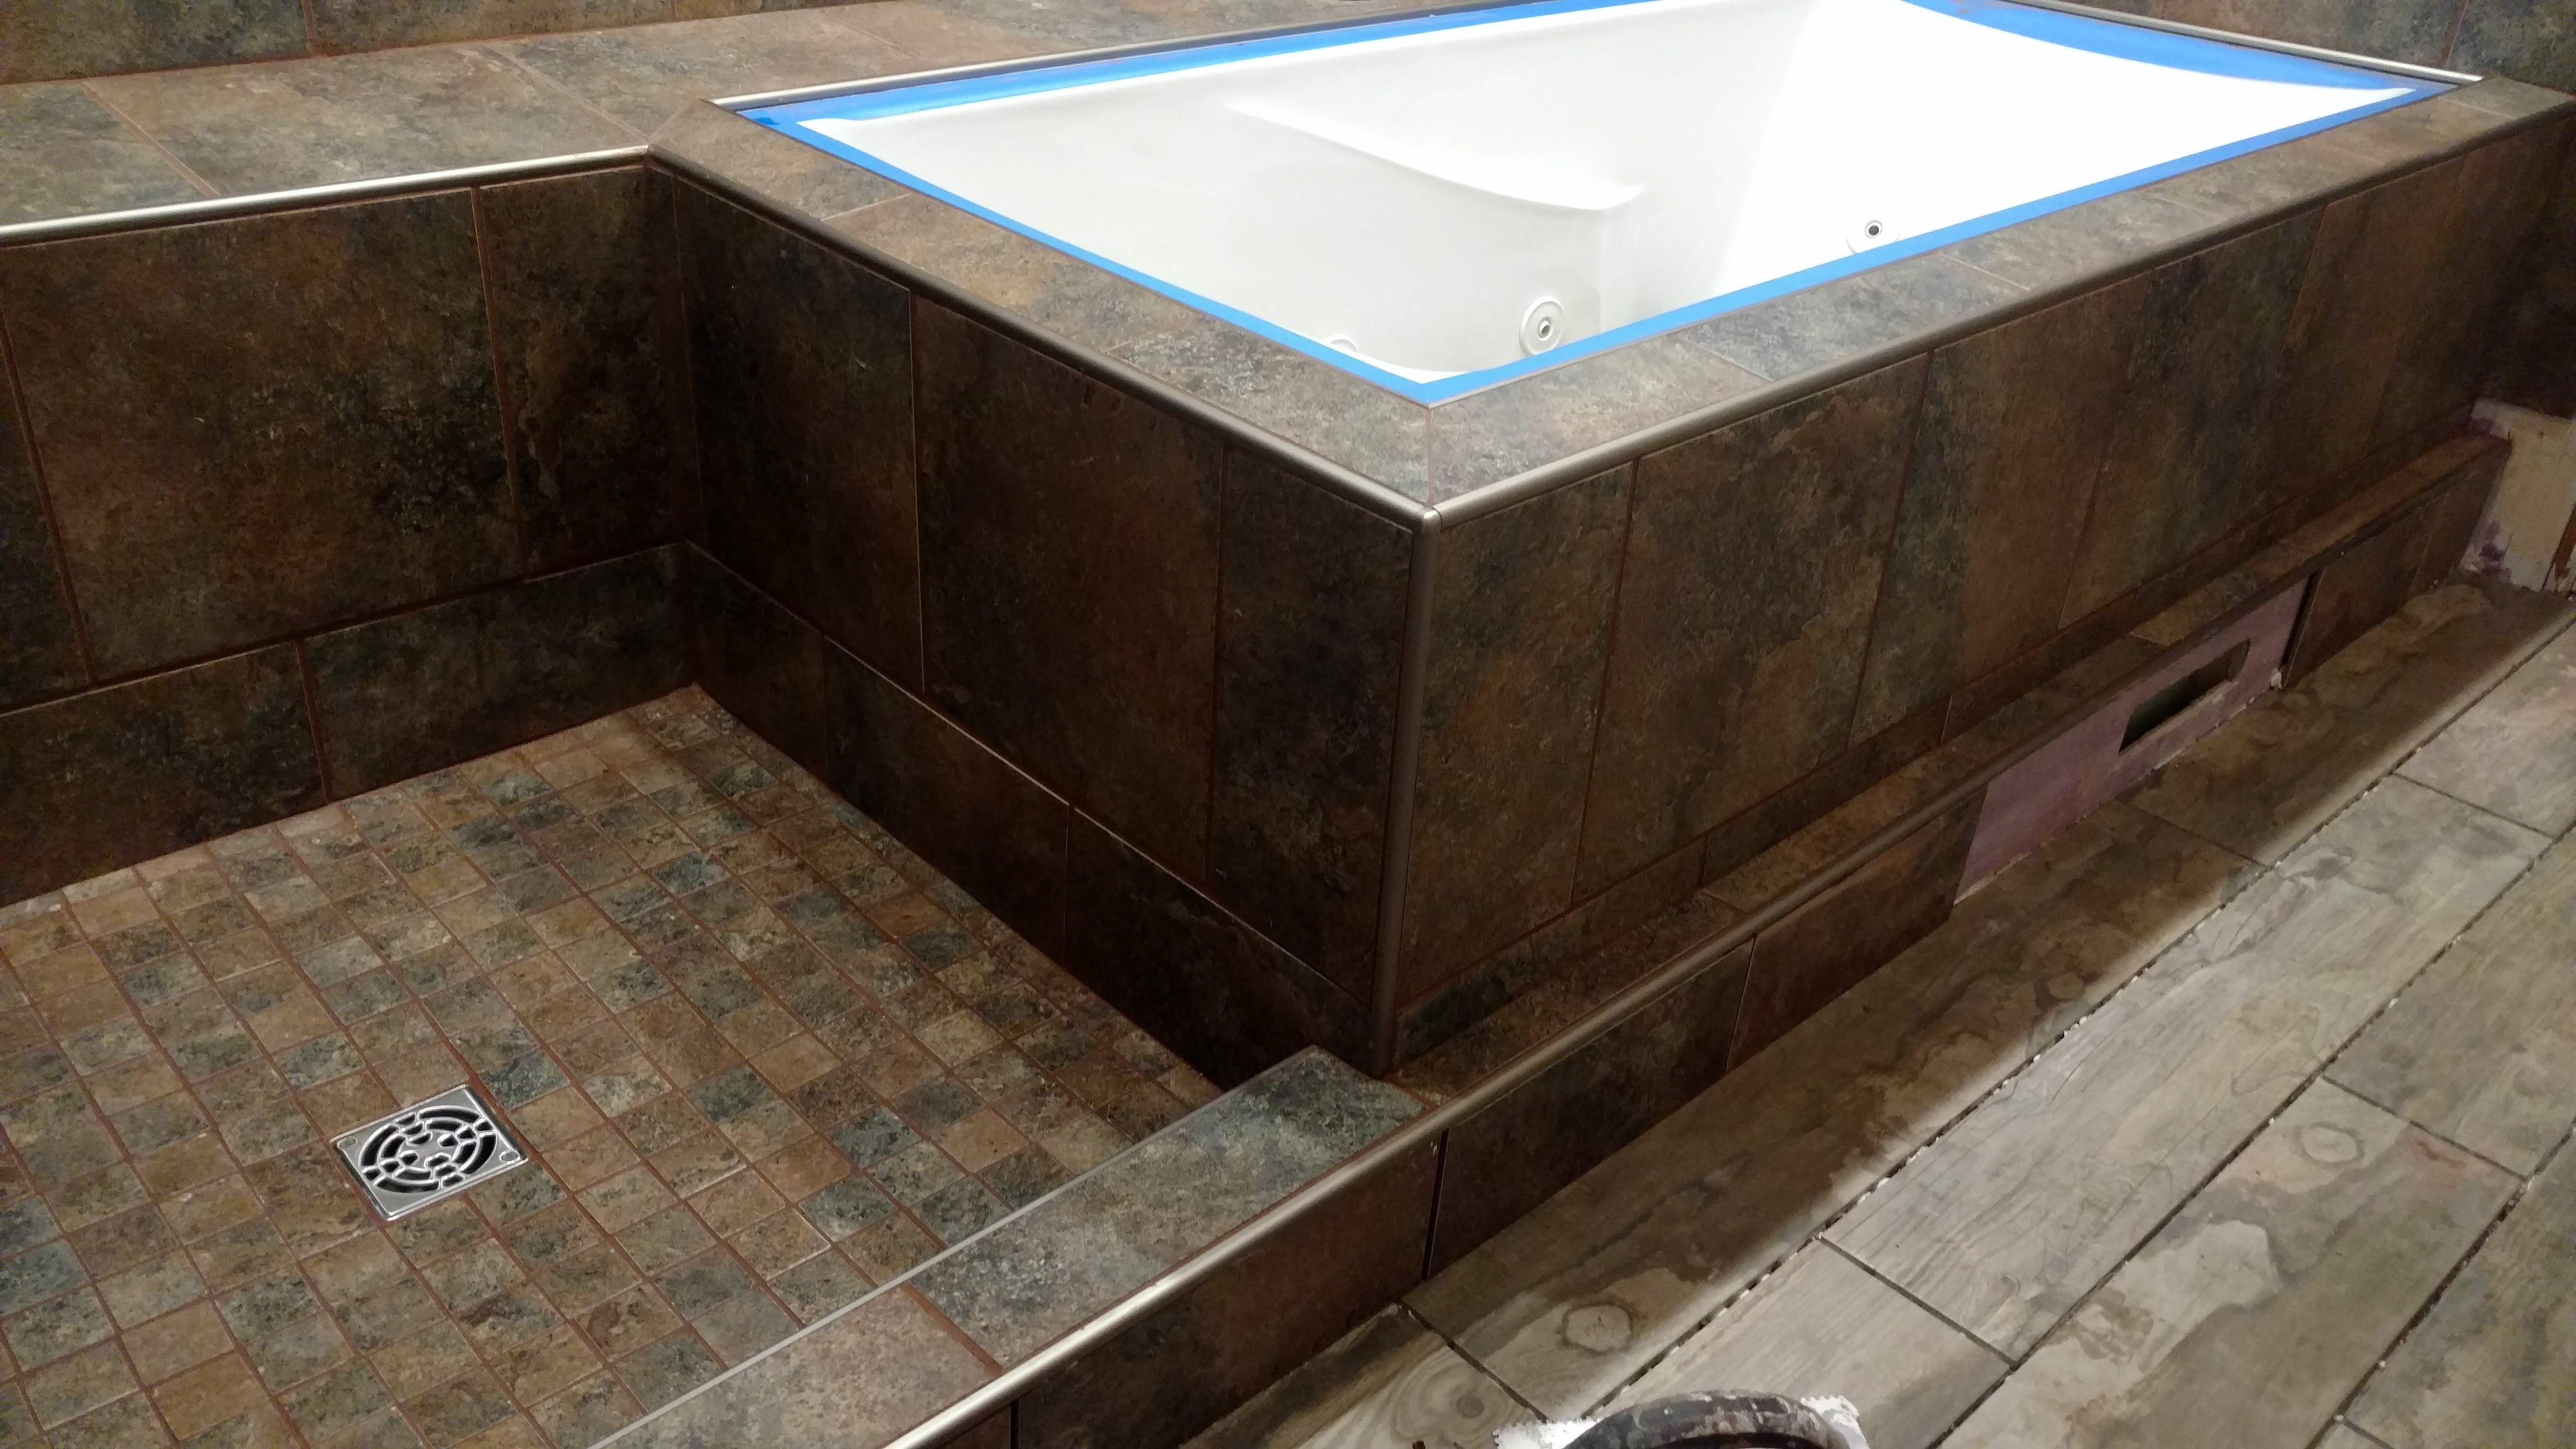 Cutting 12x24 floor tile into shower floor tile tiling cutting 12x24 floor tile into shower floor tile dailygadgetfo Choice Image